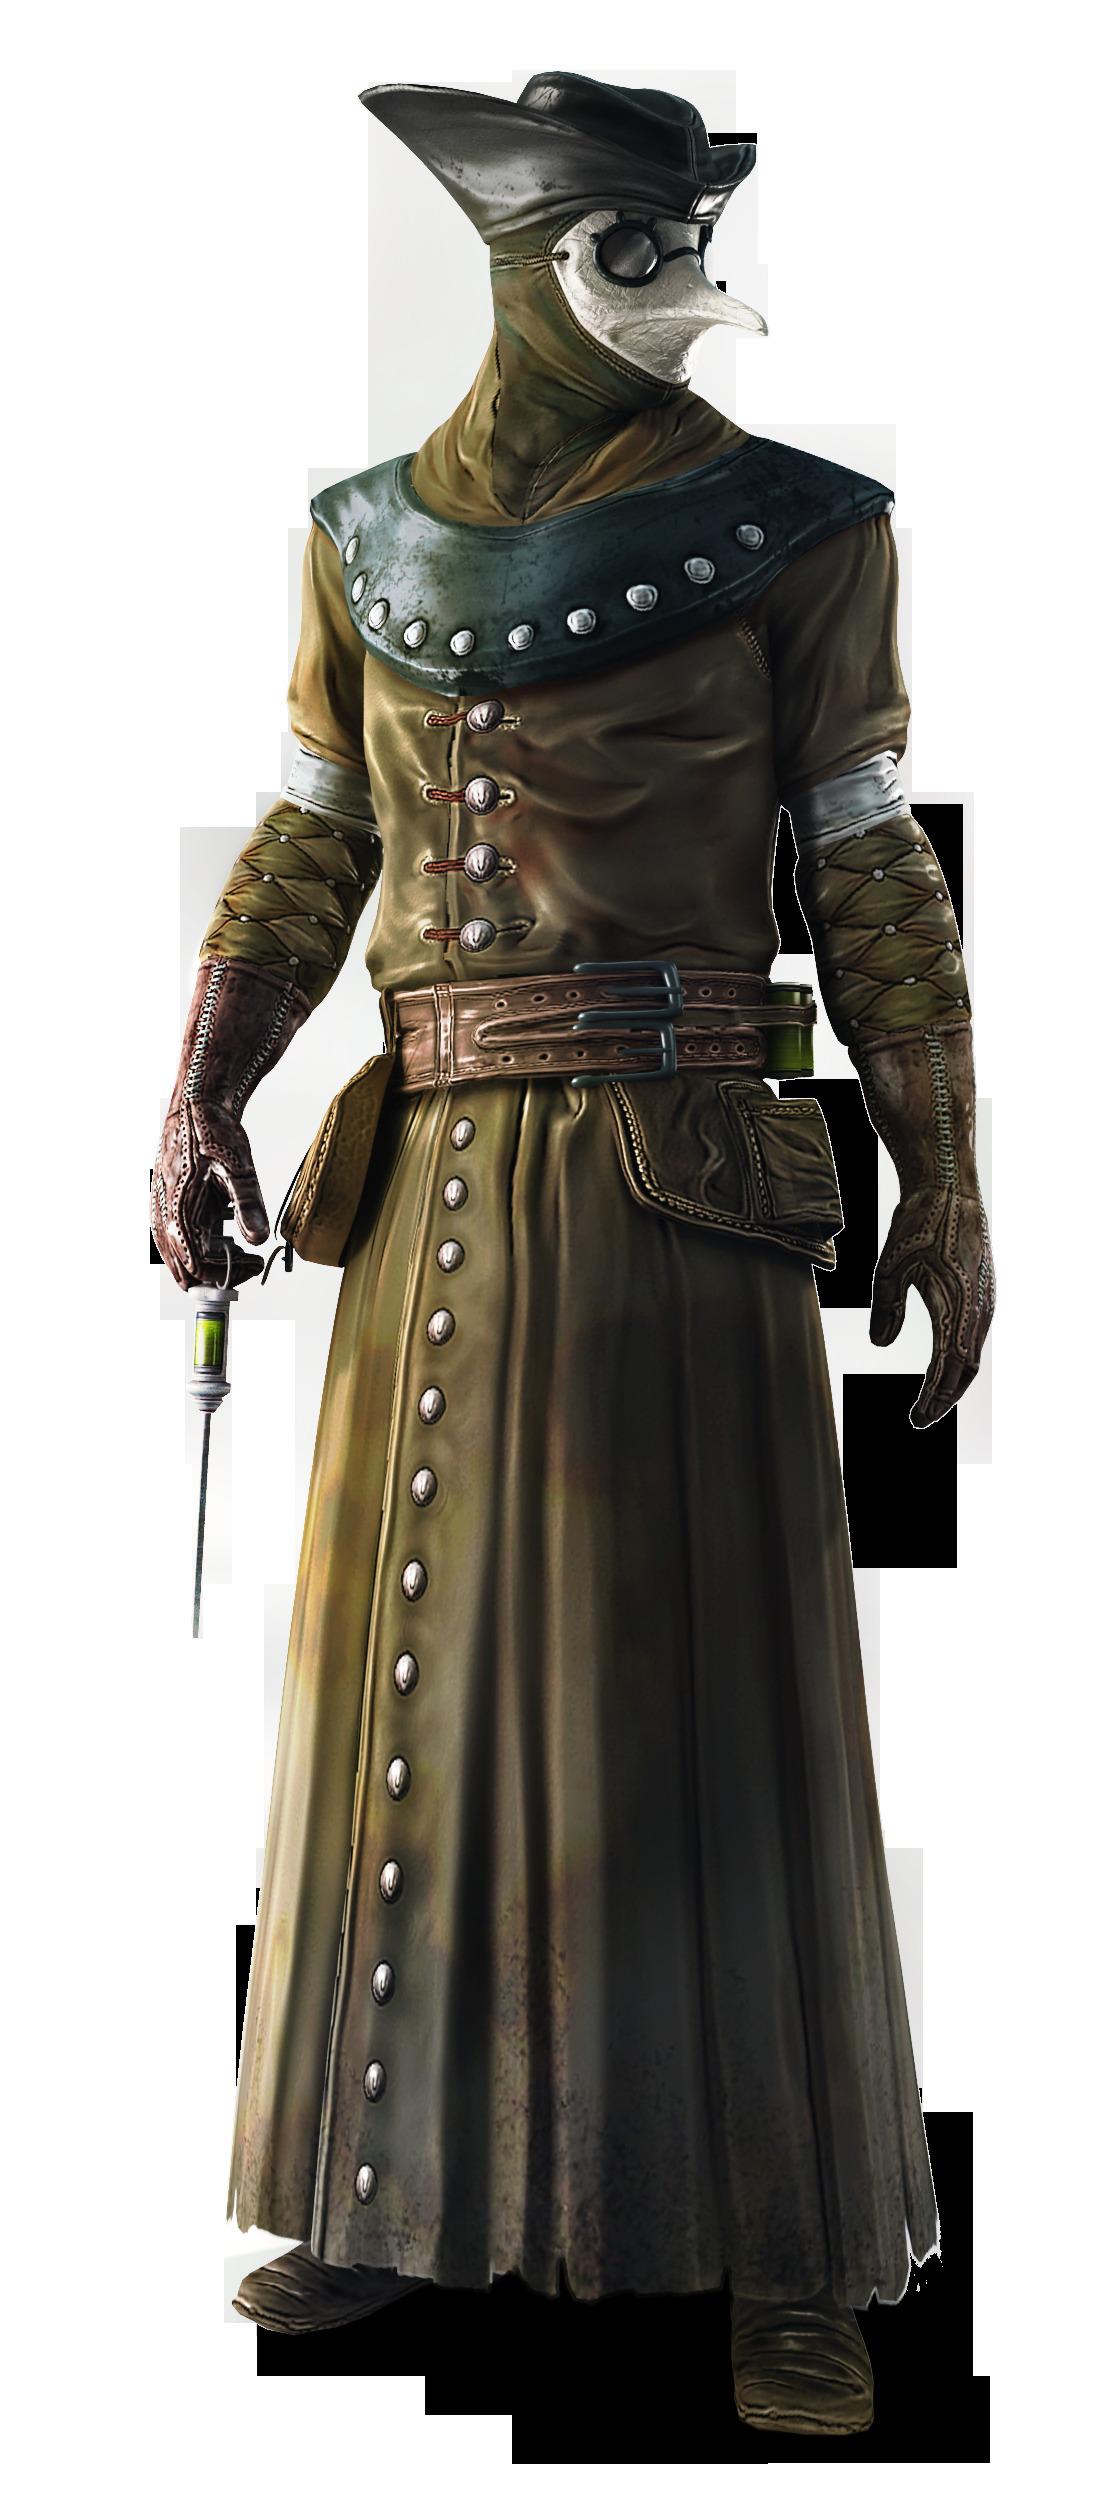 AssassinsCreedBrotherhood Visuel006